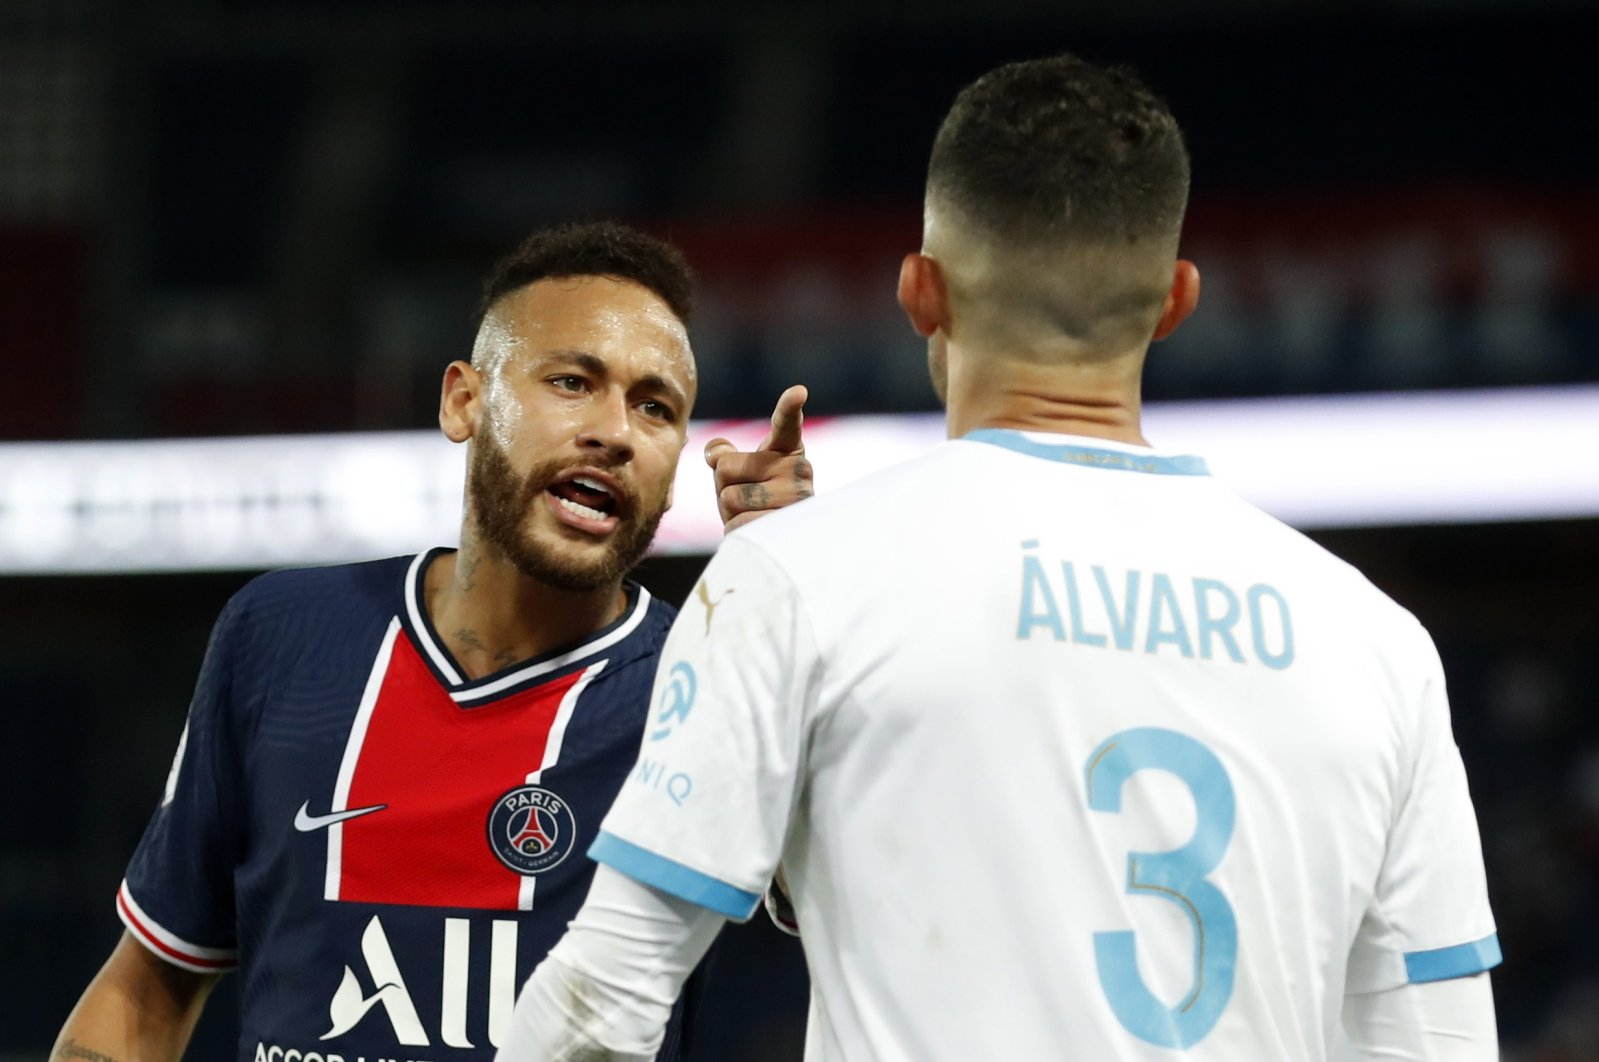 Neymar clashes with Alvaro Gonzalez, in Paris, France, Sept. 13, 2020. (REUTERS Photo)